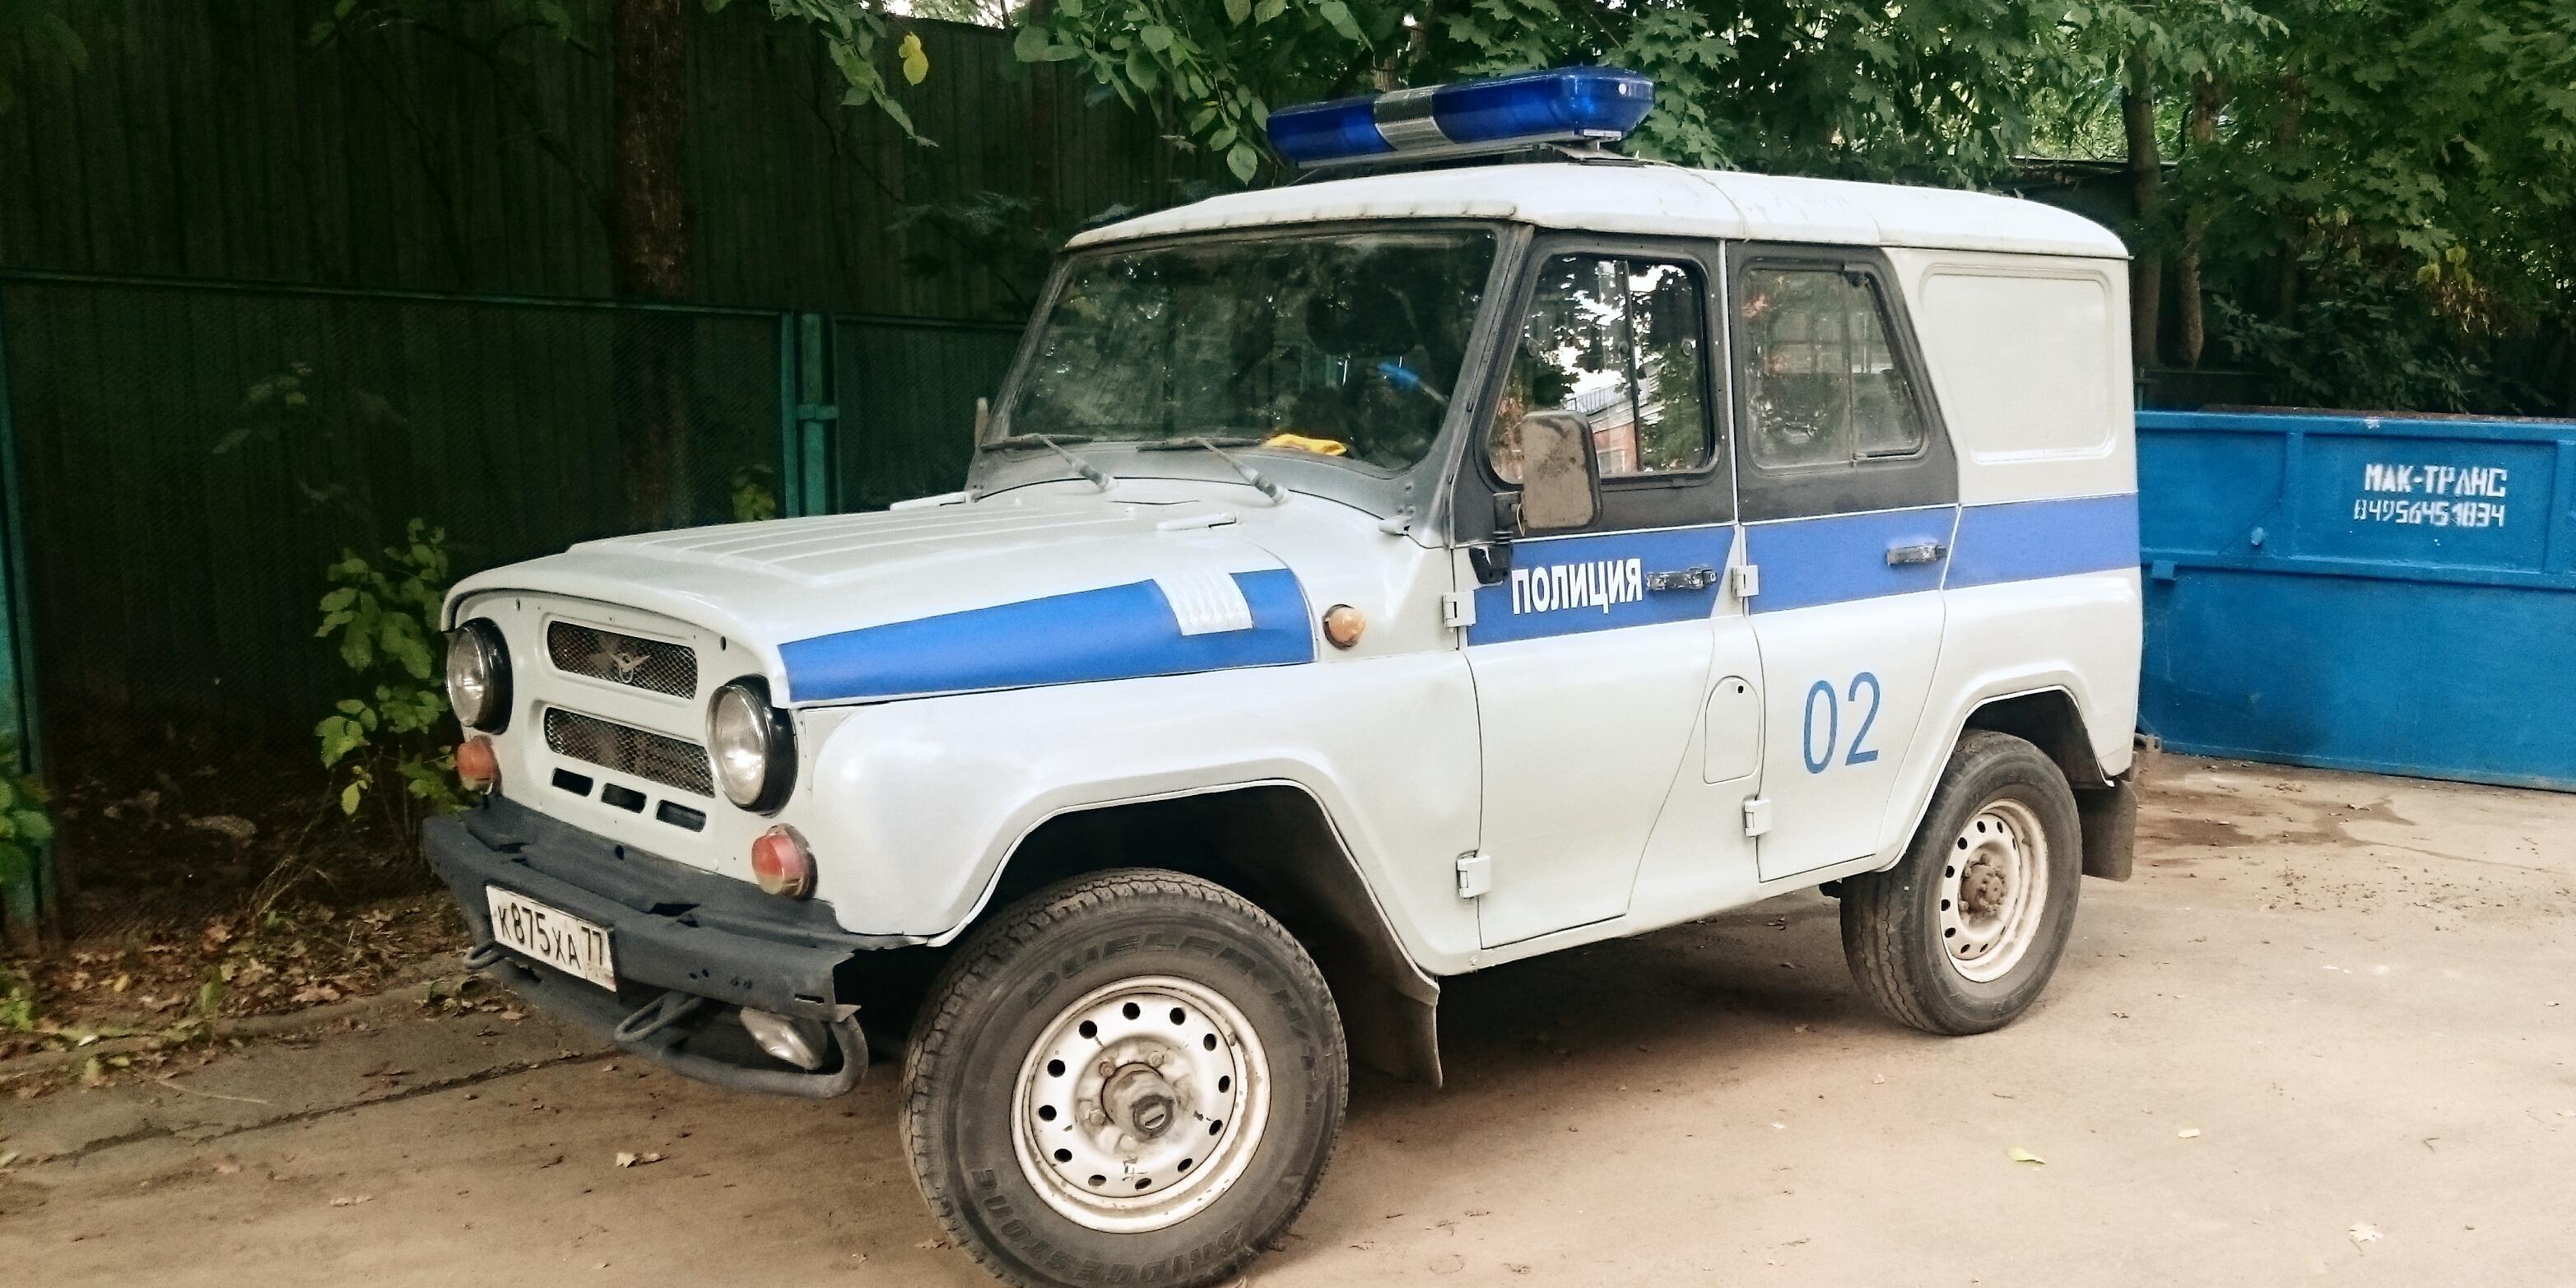 В Иркутске полицейские едва не сожгли подростков в машине и снимали это на камеру